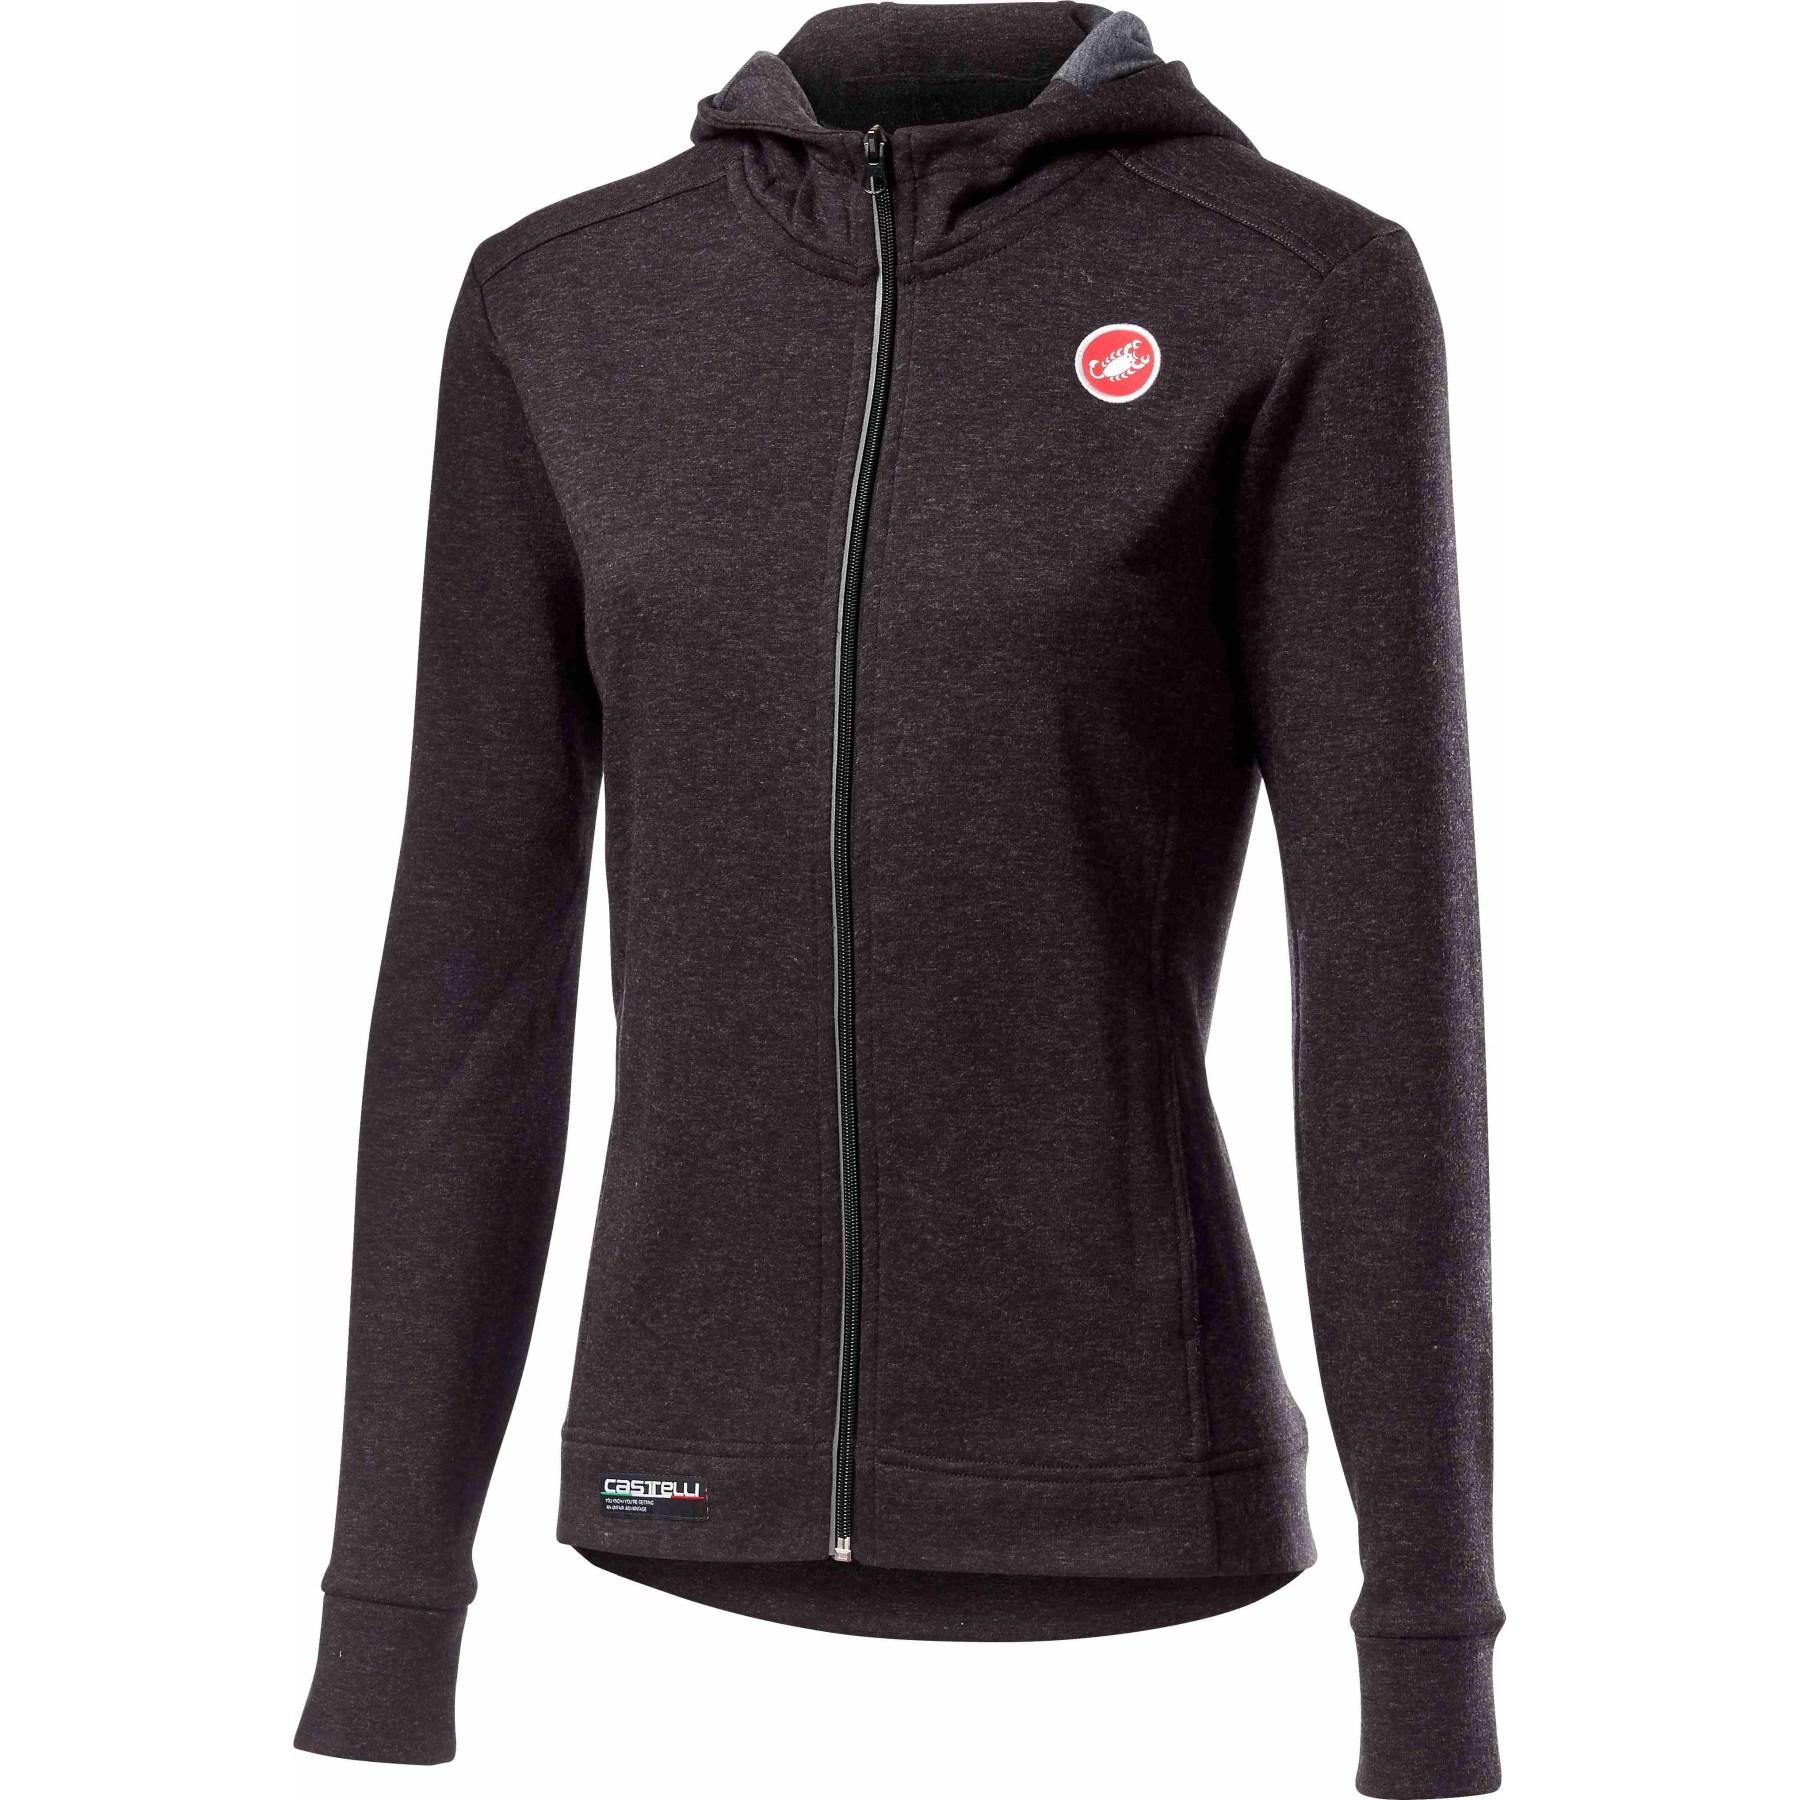 Castelli Milano Full Zip W Fleece Women's Jacket - melange light black